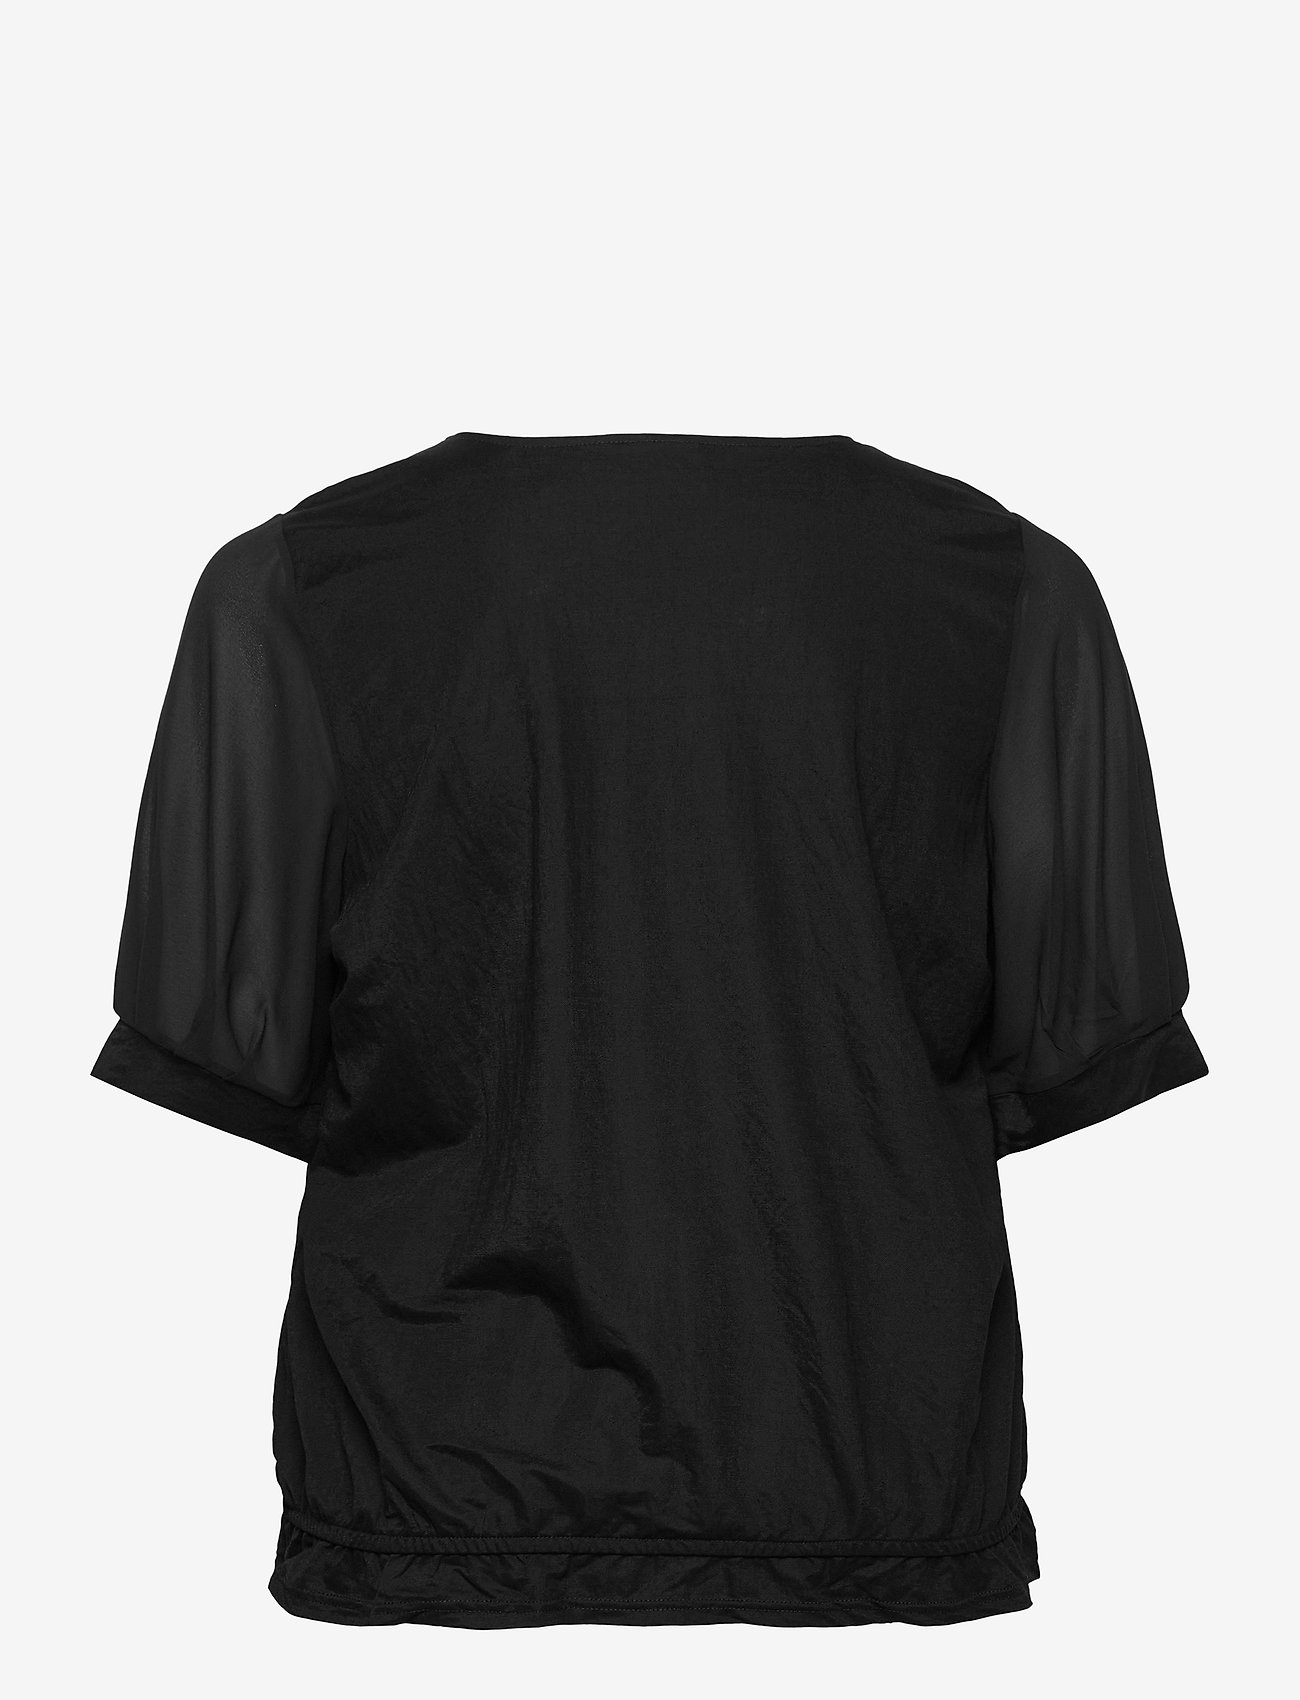 Jrjahlina 2/4 Sleeve Blouse - S (Black) (24.49 €) - JunaRose CXiU8